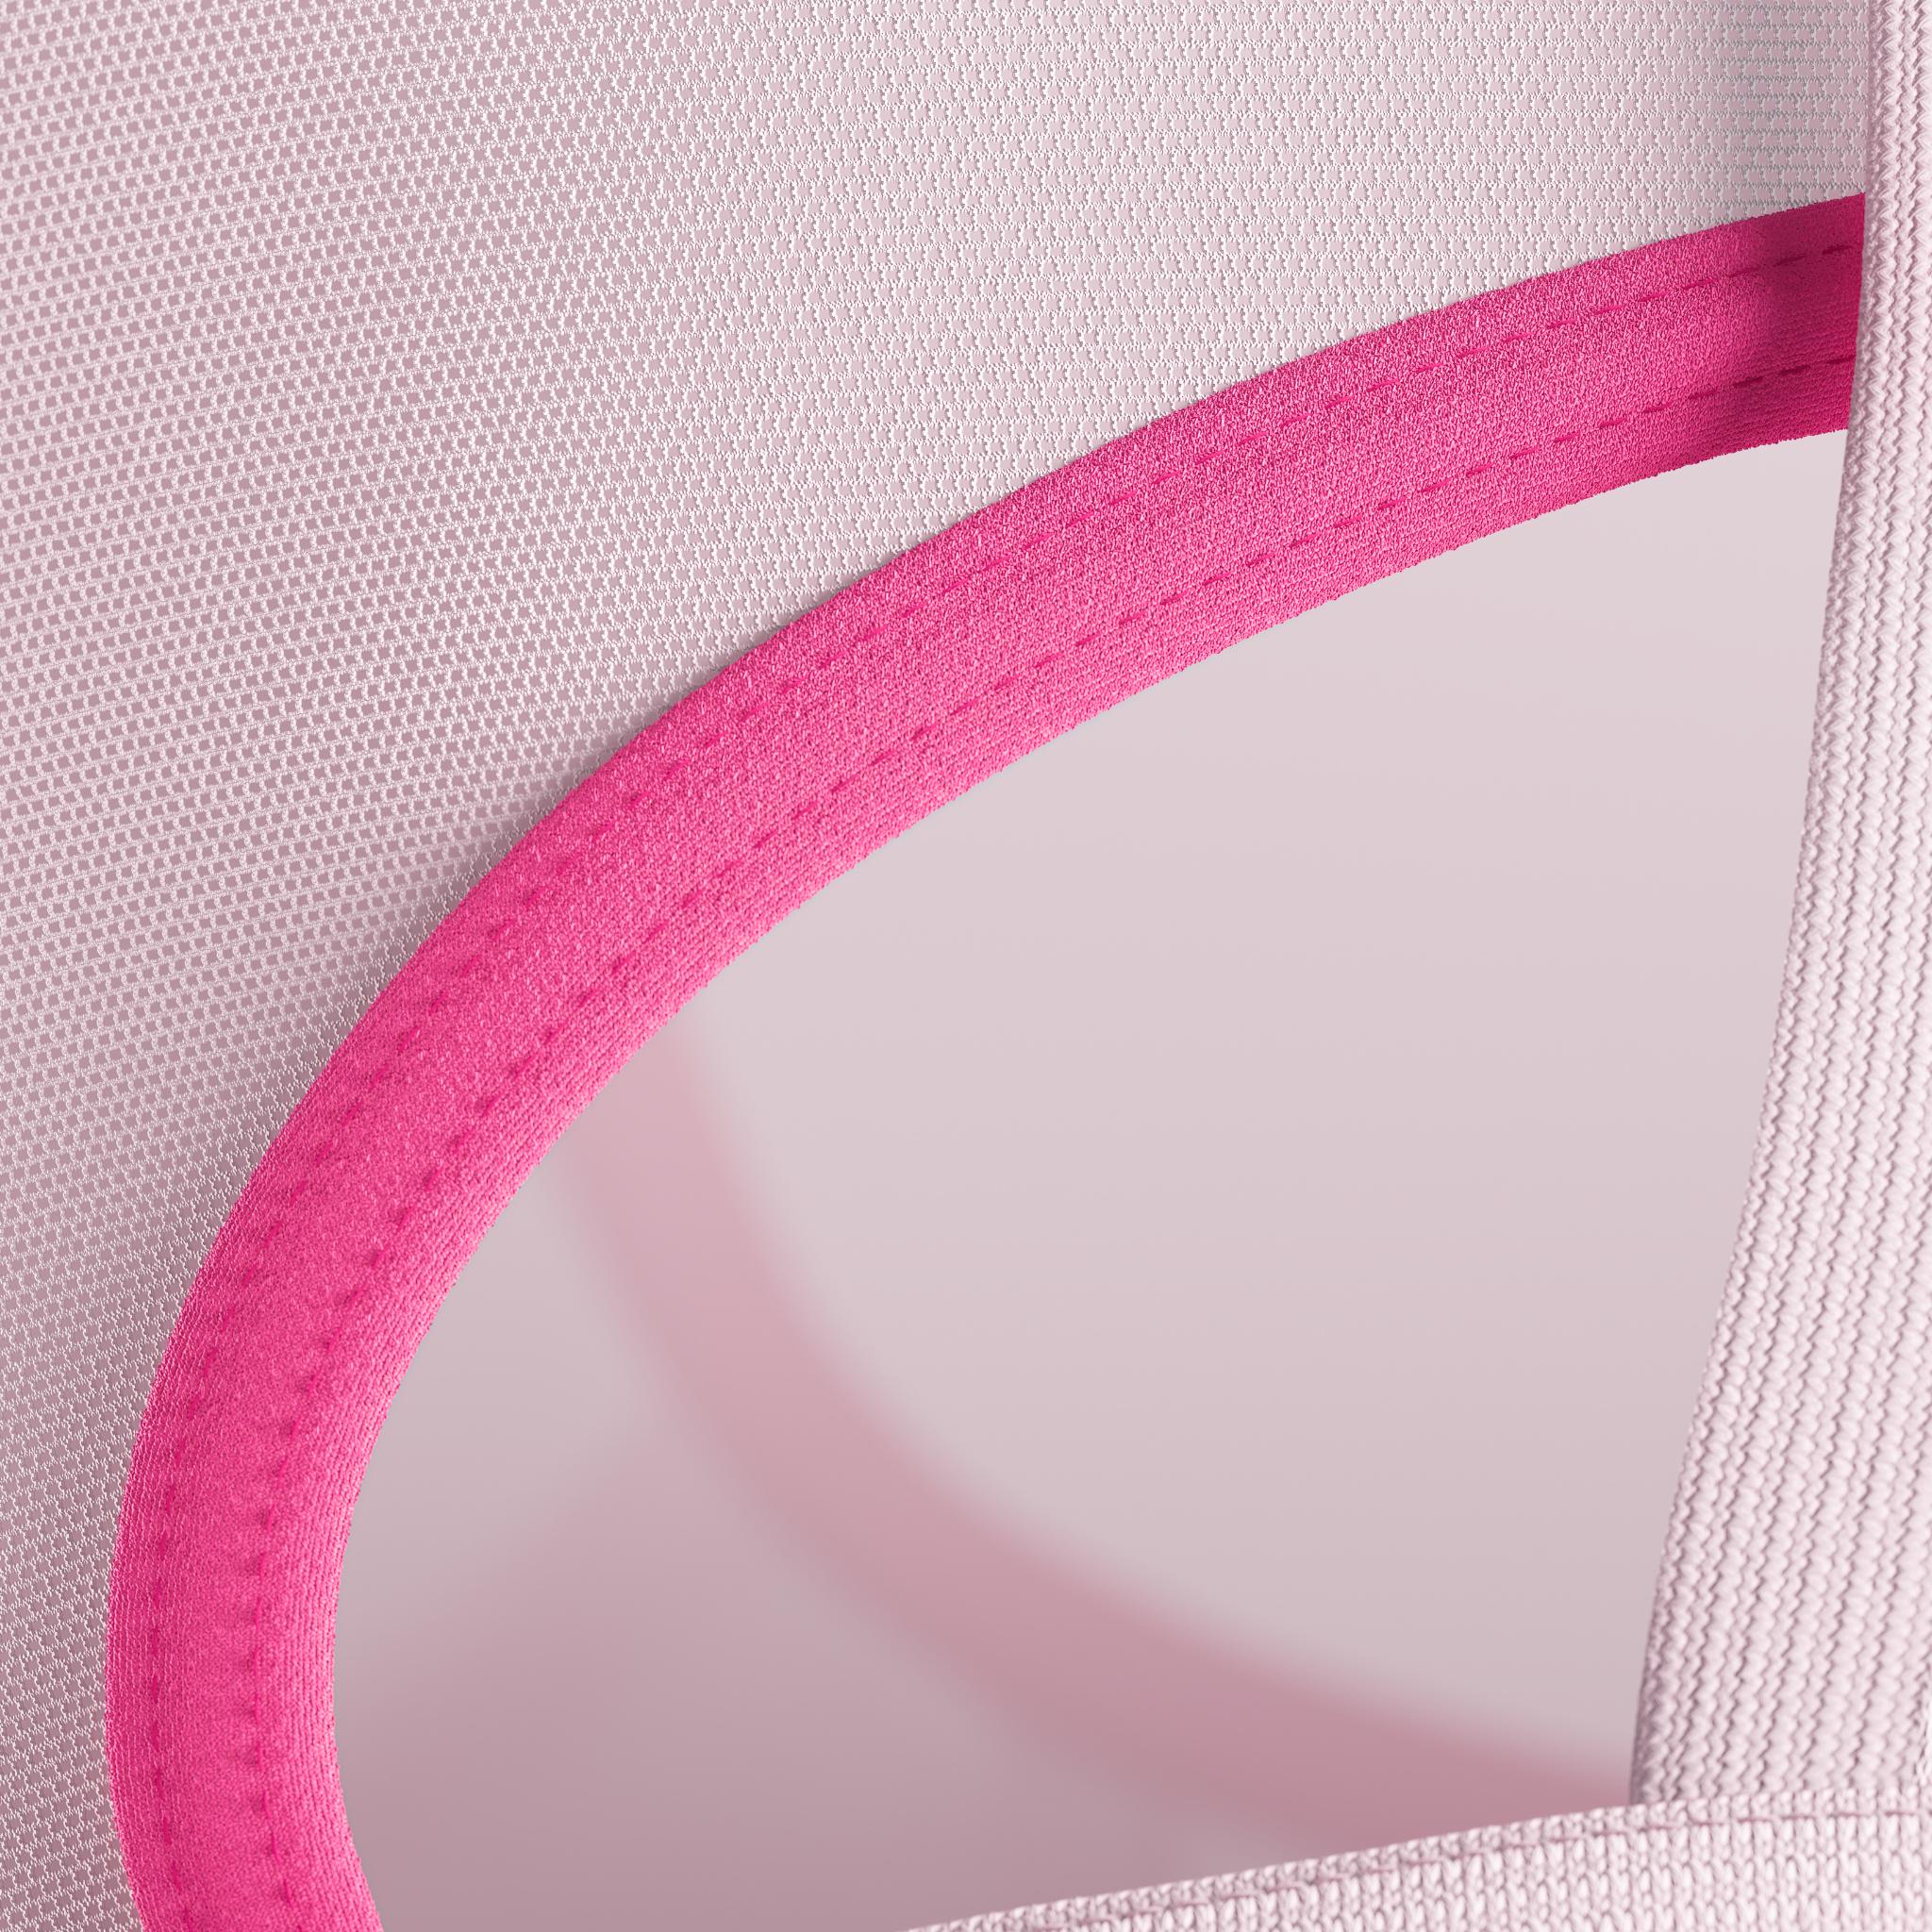 Nike_Ultrabreathe_Bra_Swoosh_Pink_Macro_02_2K